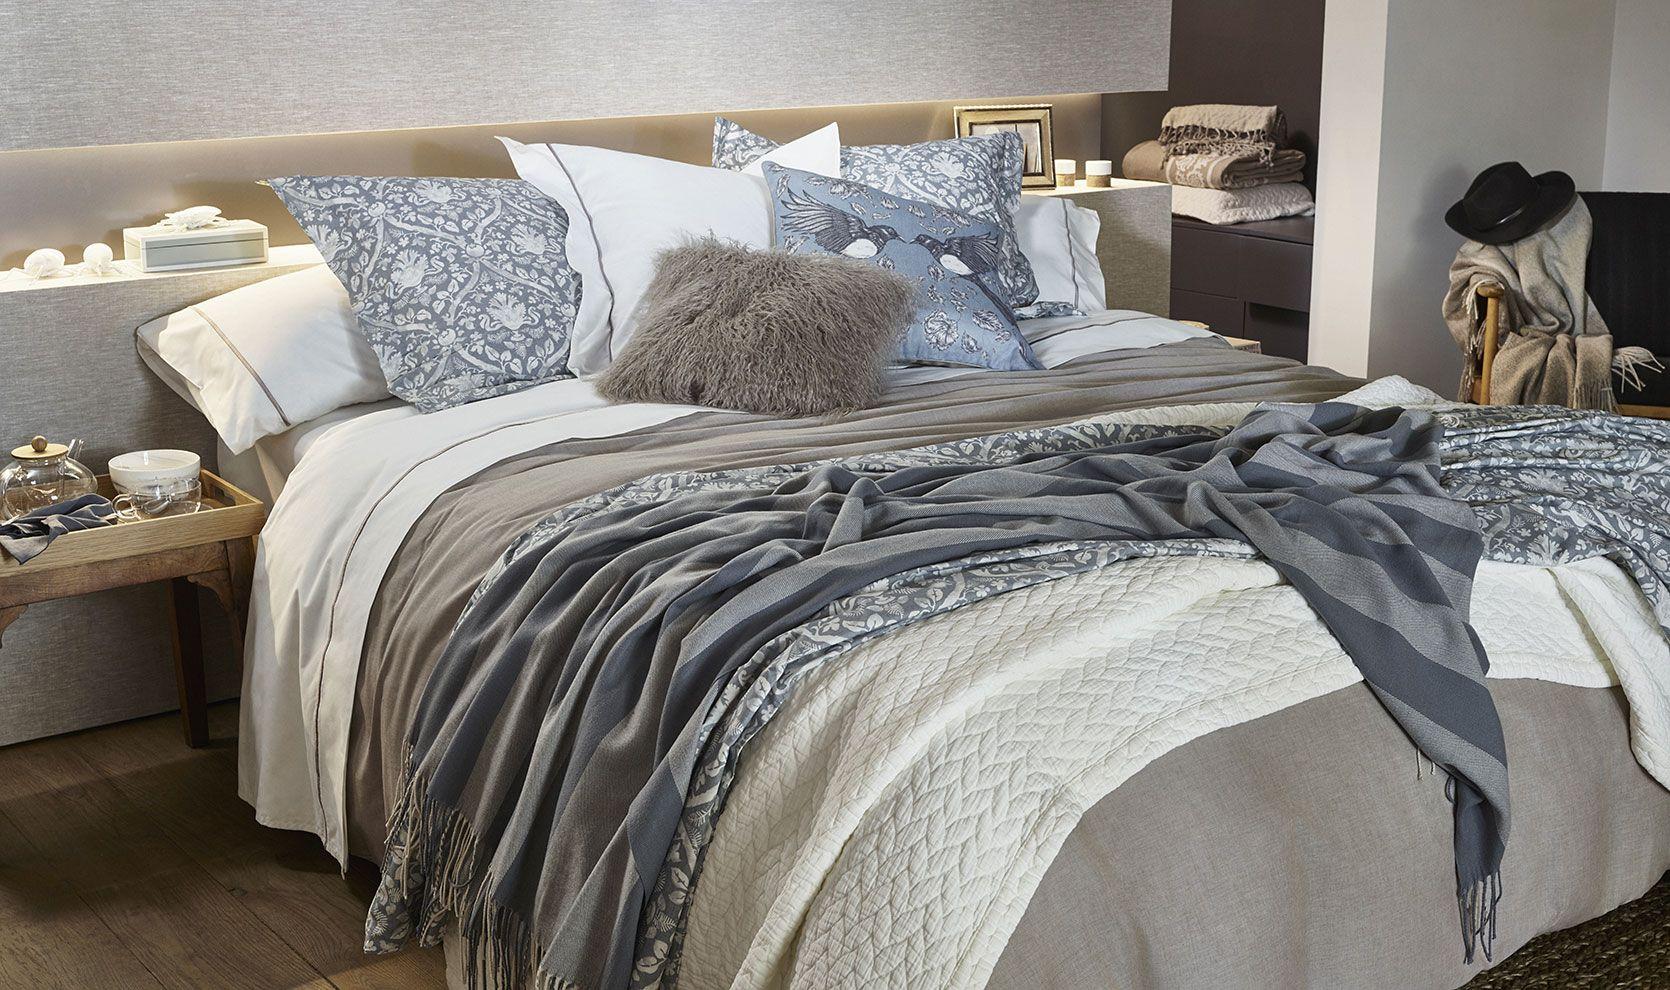 Zara home belgium home page mama 39 s bedroom pinterest casa zara home e zara for Casa home belgique